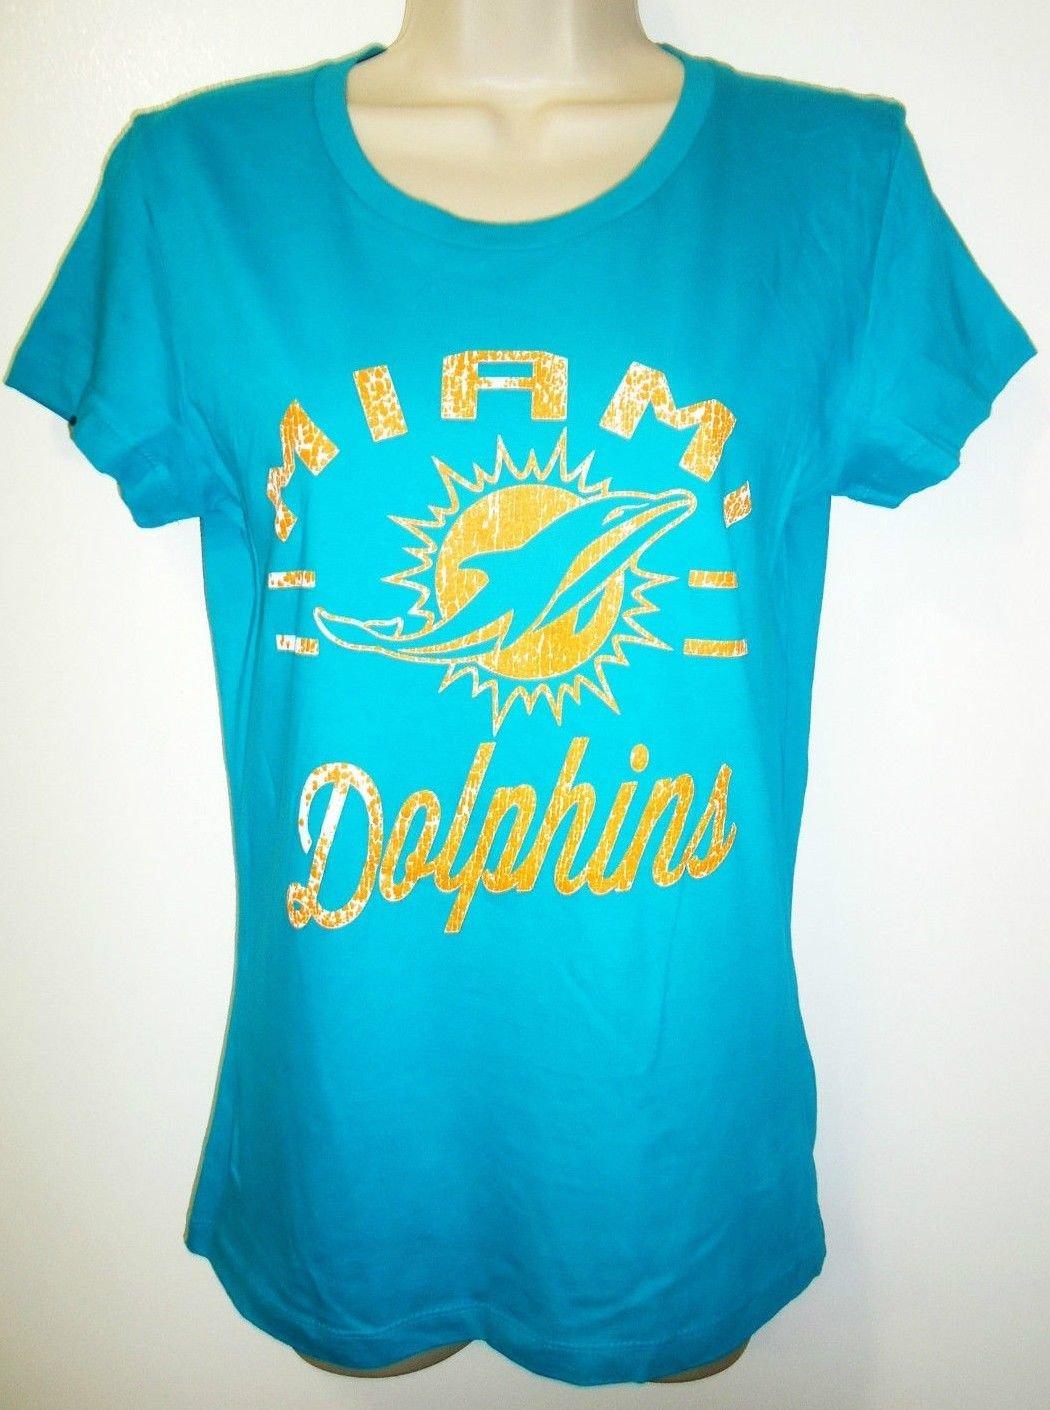 MAJESTIC - MIAMI - DOLPHINS - NFL - TEAM - T-SHIRT - NEW - ORANGE - AQUA - M